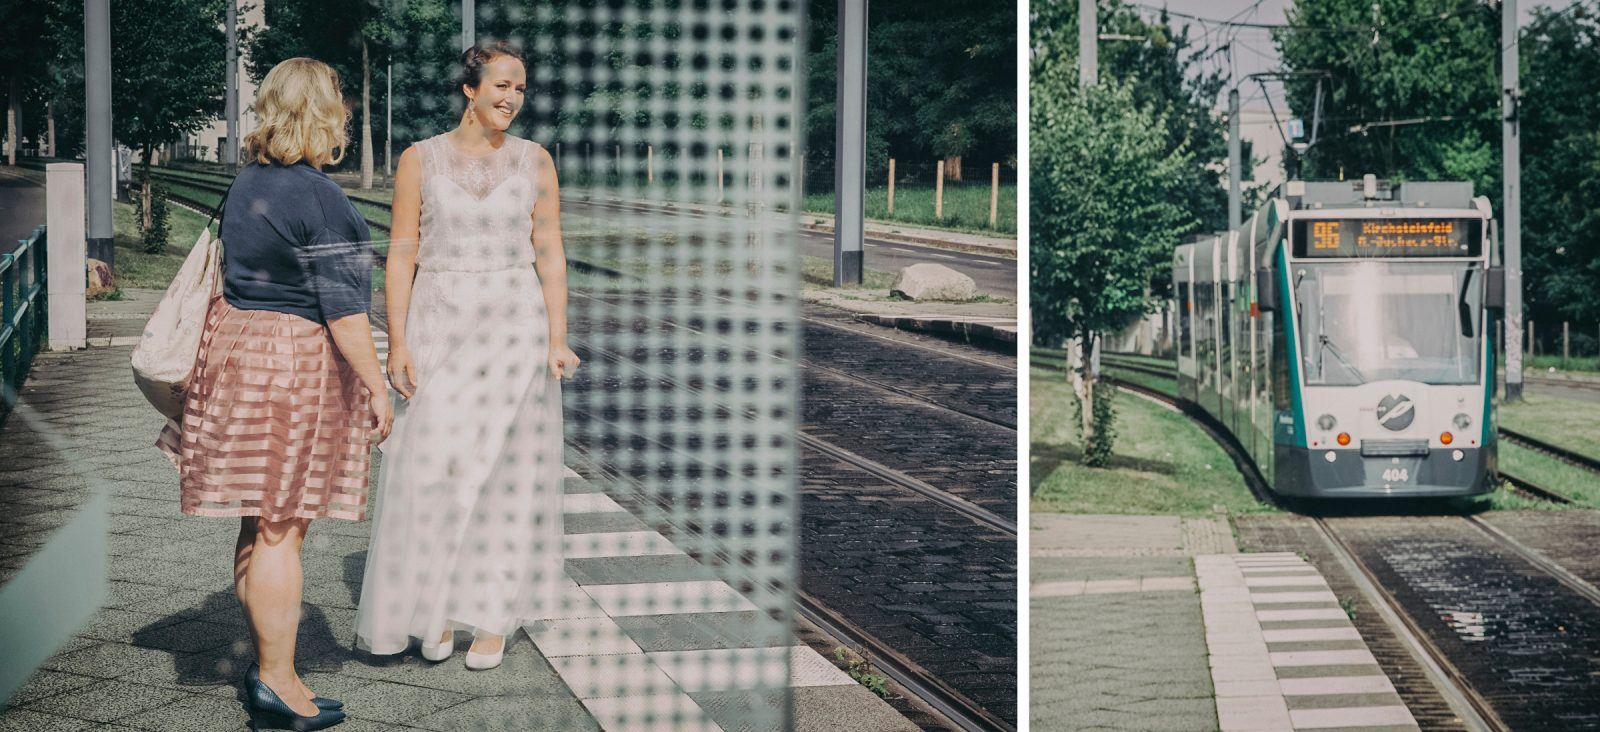 Hochzeit_Potsdam_fotograf_G1_1